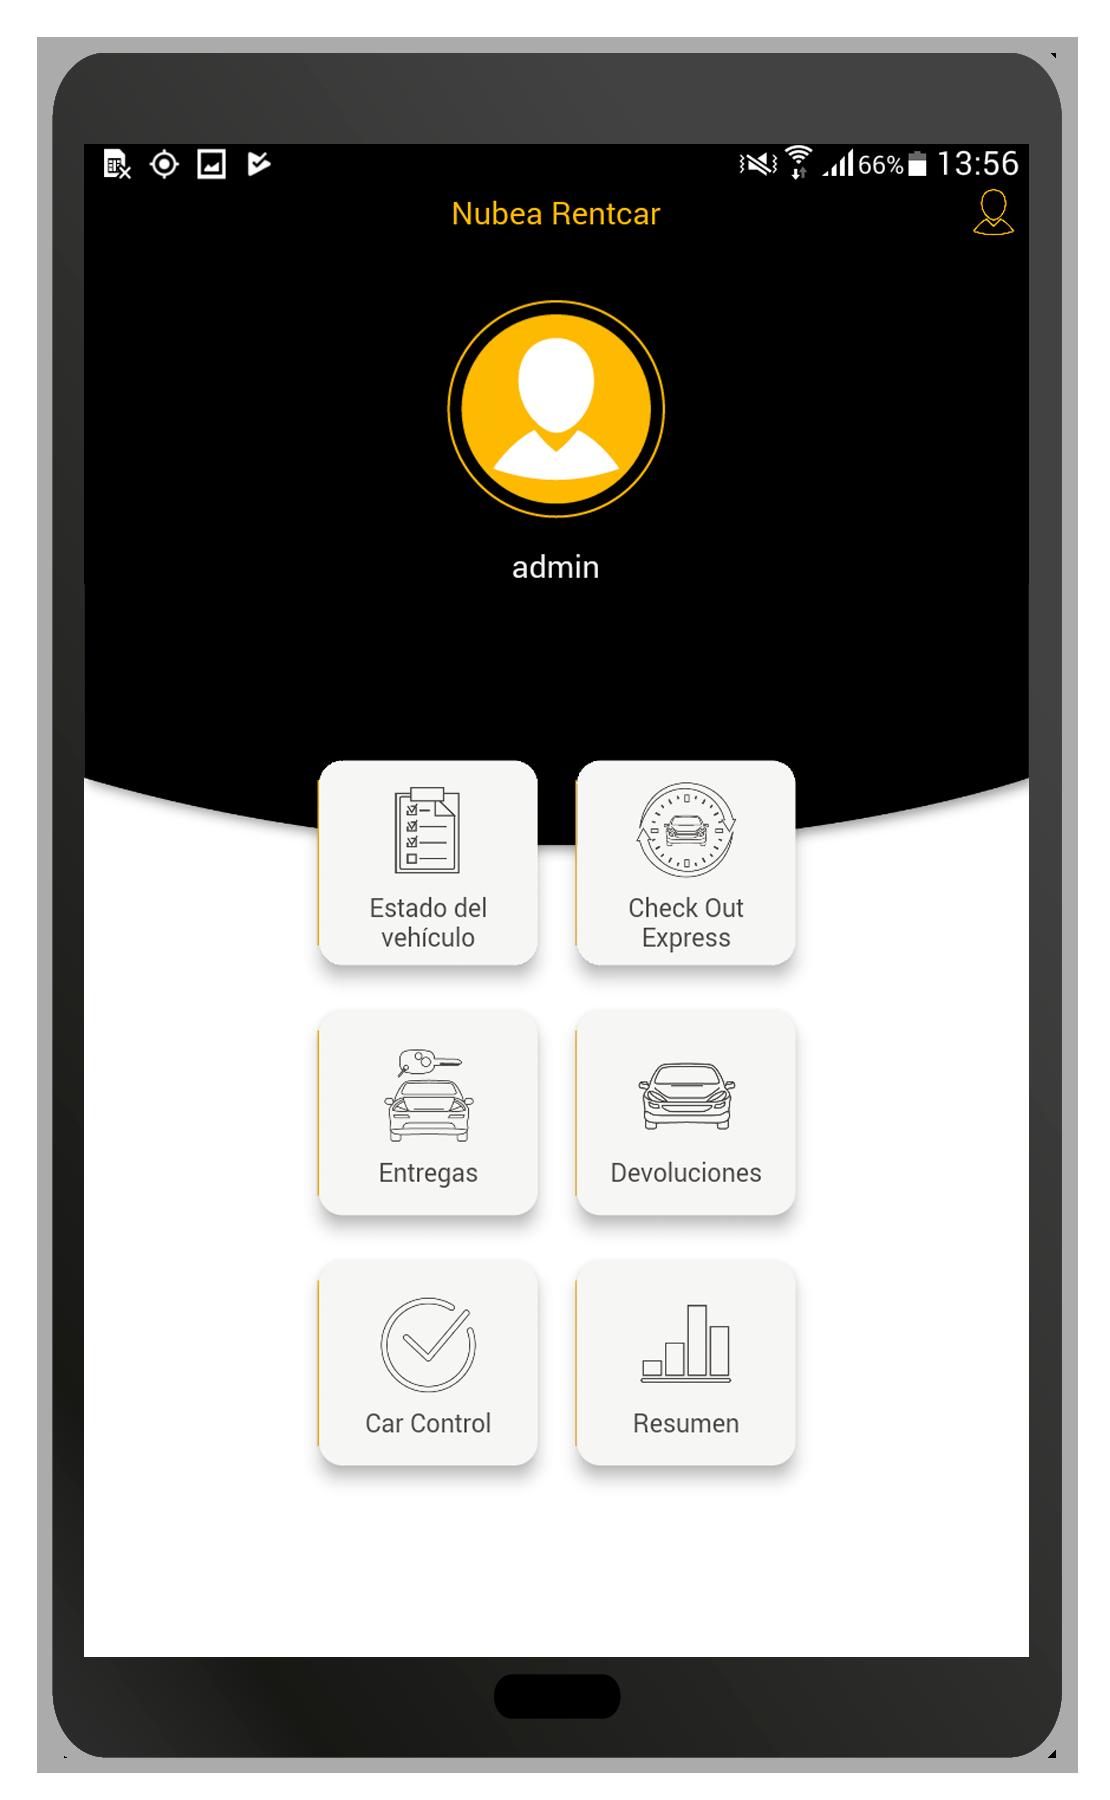 tablet-app-nubea-rentcar